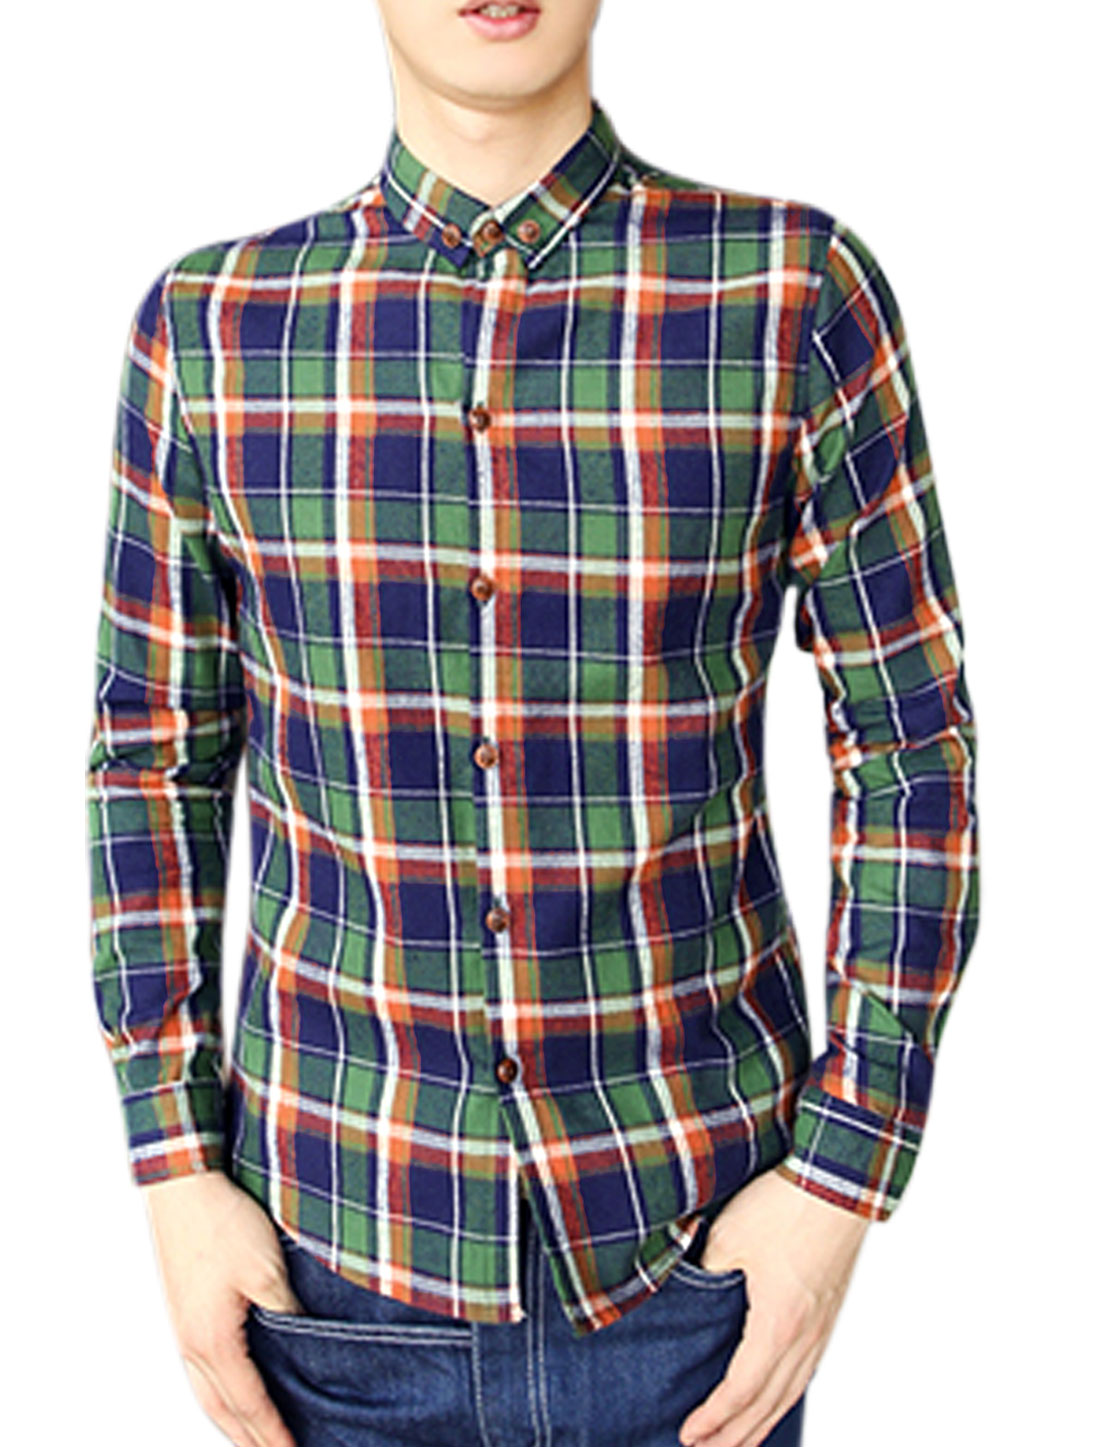 Men Long Sleeve Point Collar Checks Casual Shirts Green Navy Blue M